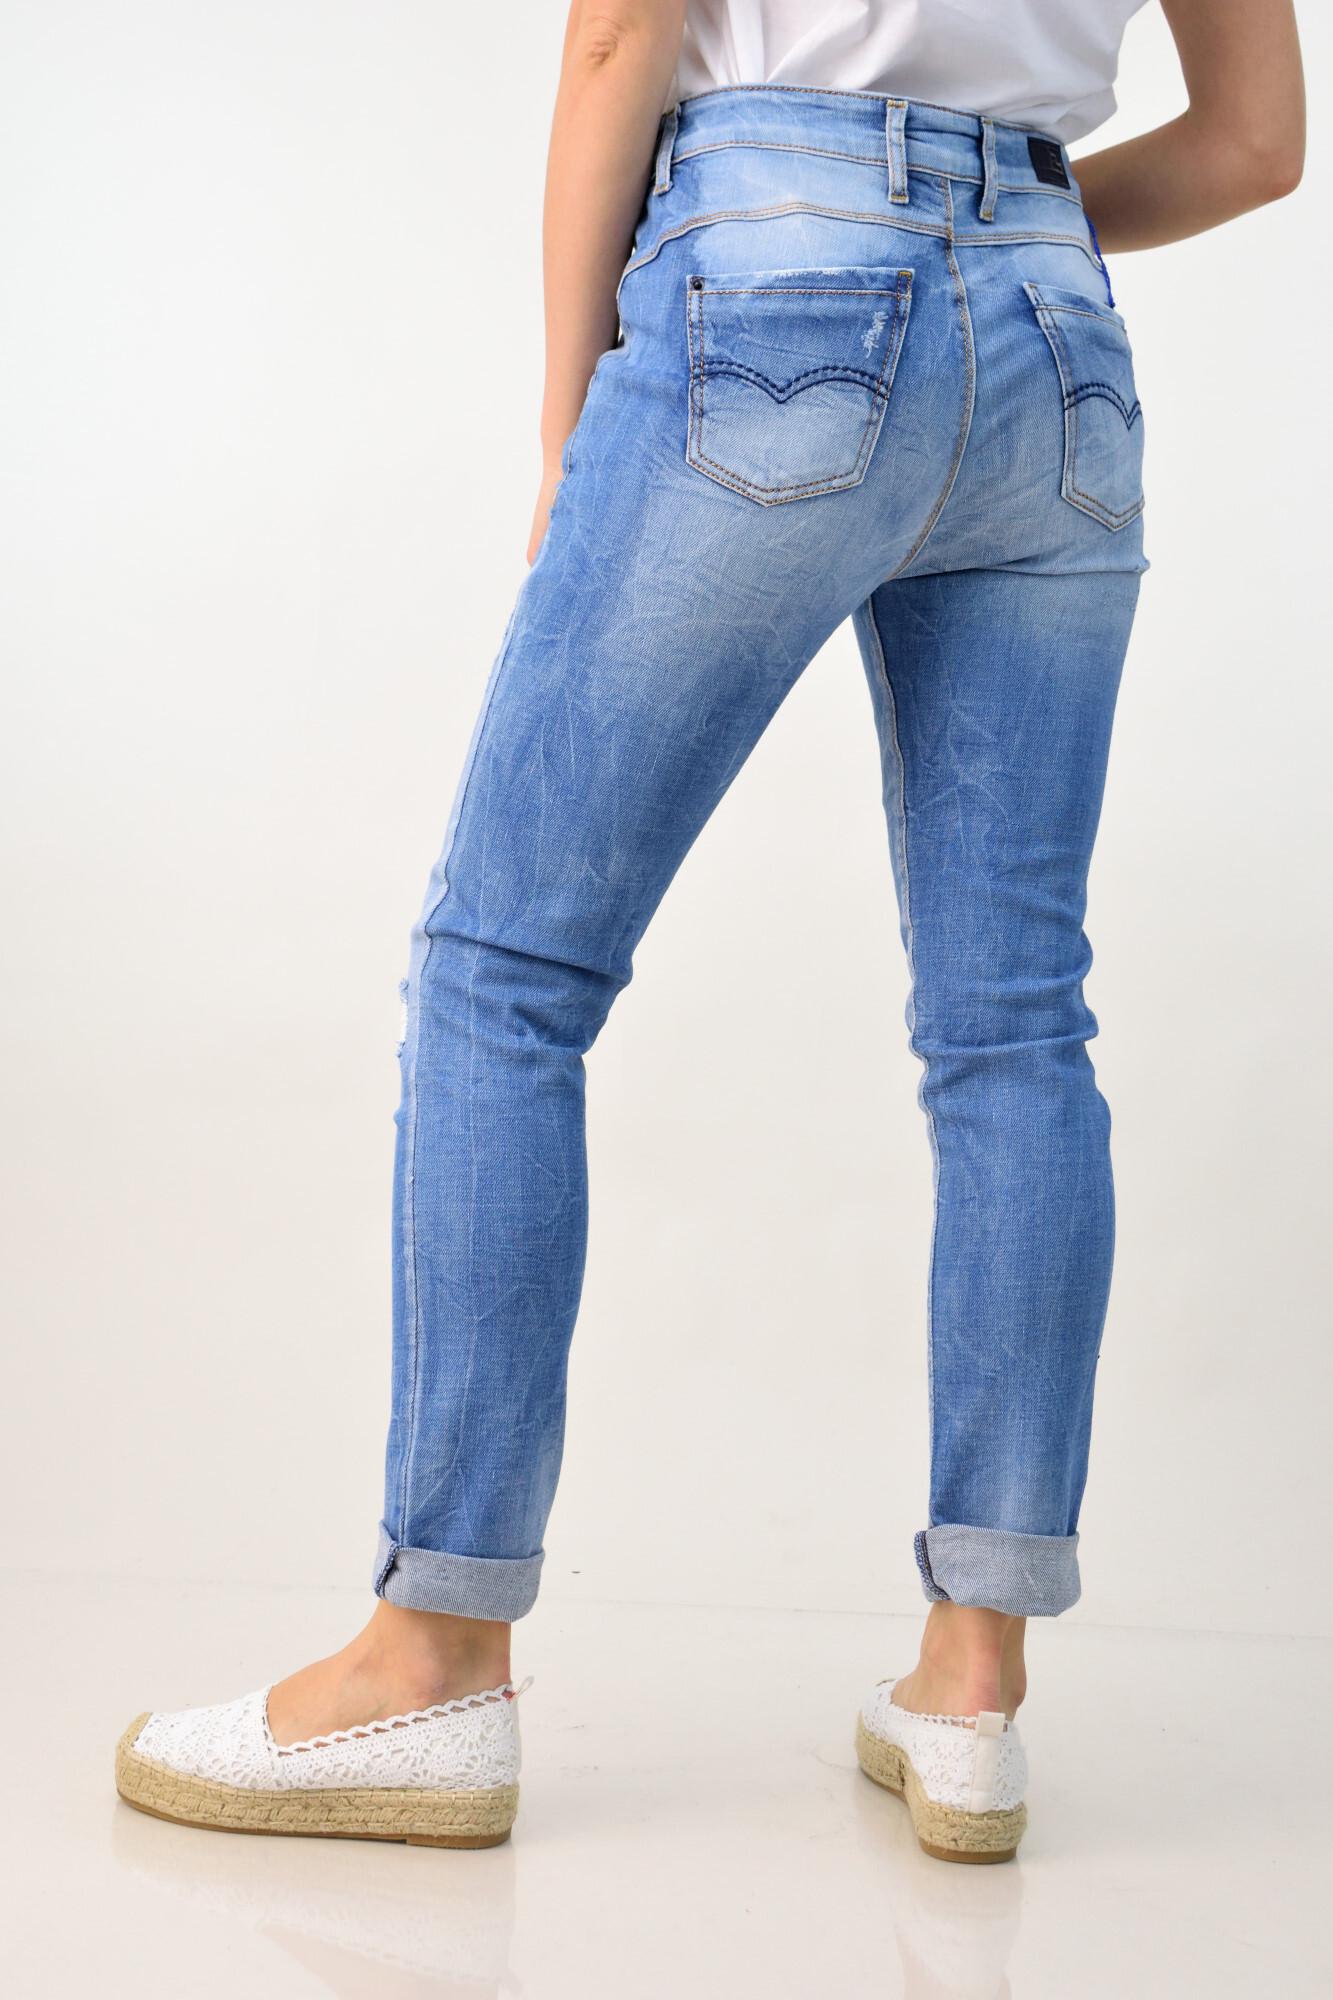 0af0ea487b51 Γυναικείο παντελόνι τζιν με σκισίματα. Tap to expand